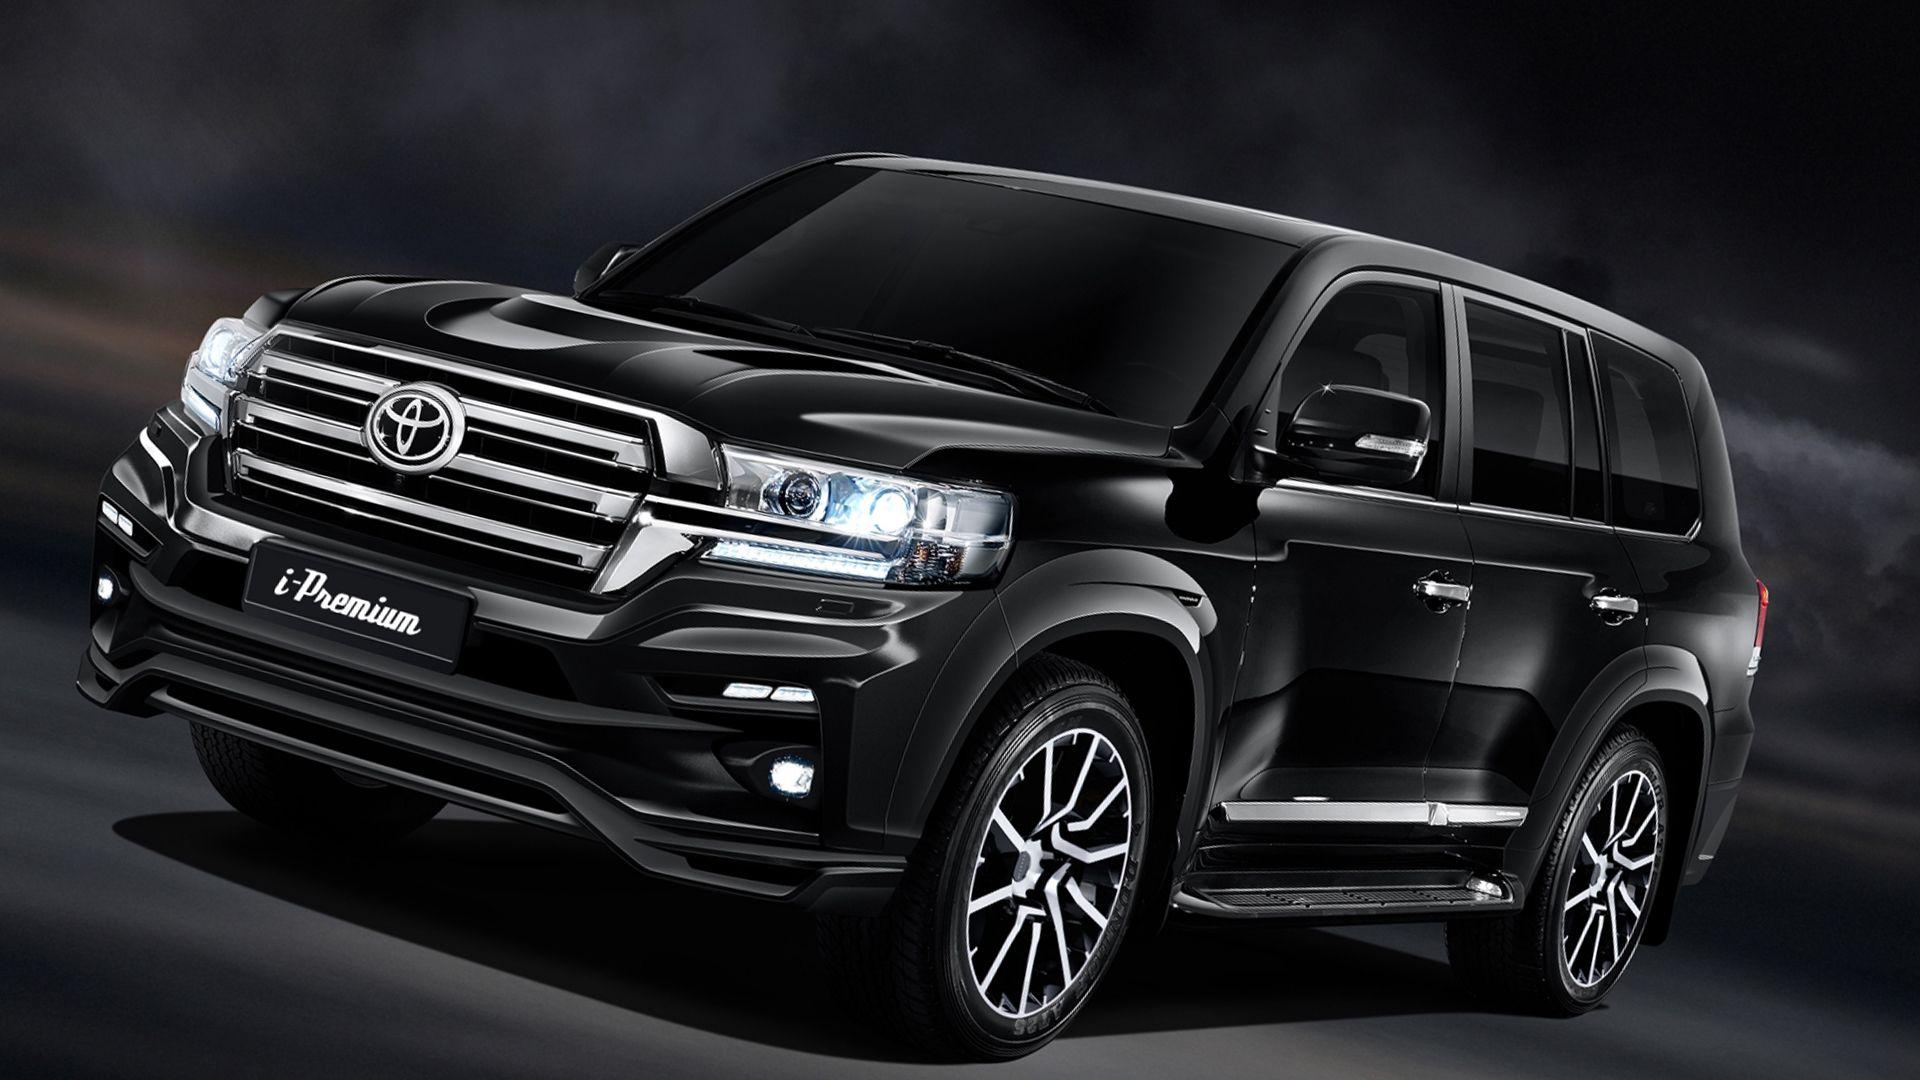 New 2019 Toyota Land Cruiser 200 Redesign Автомобили